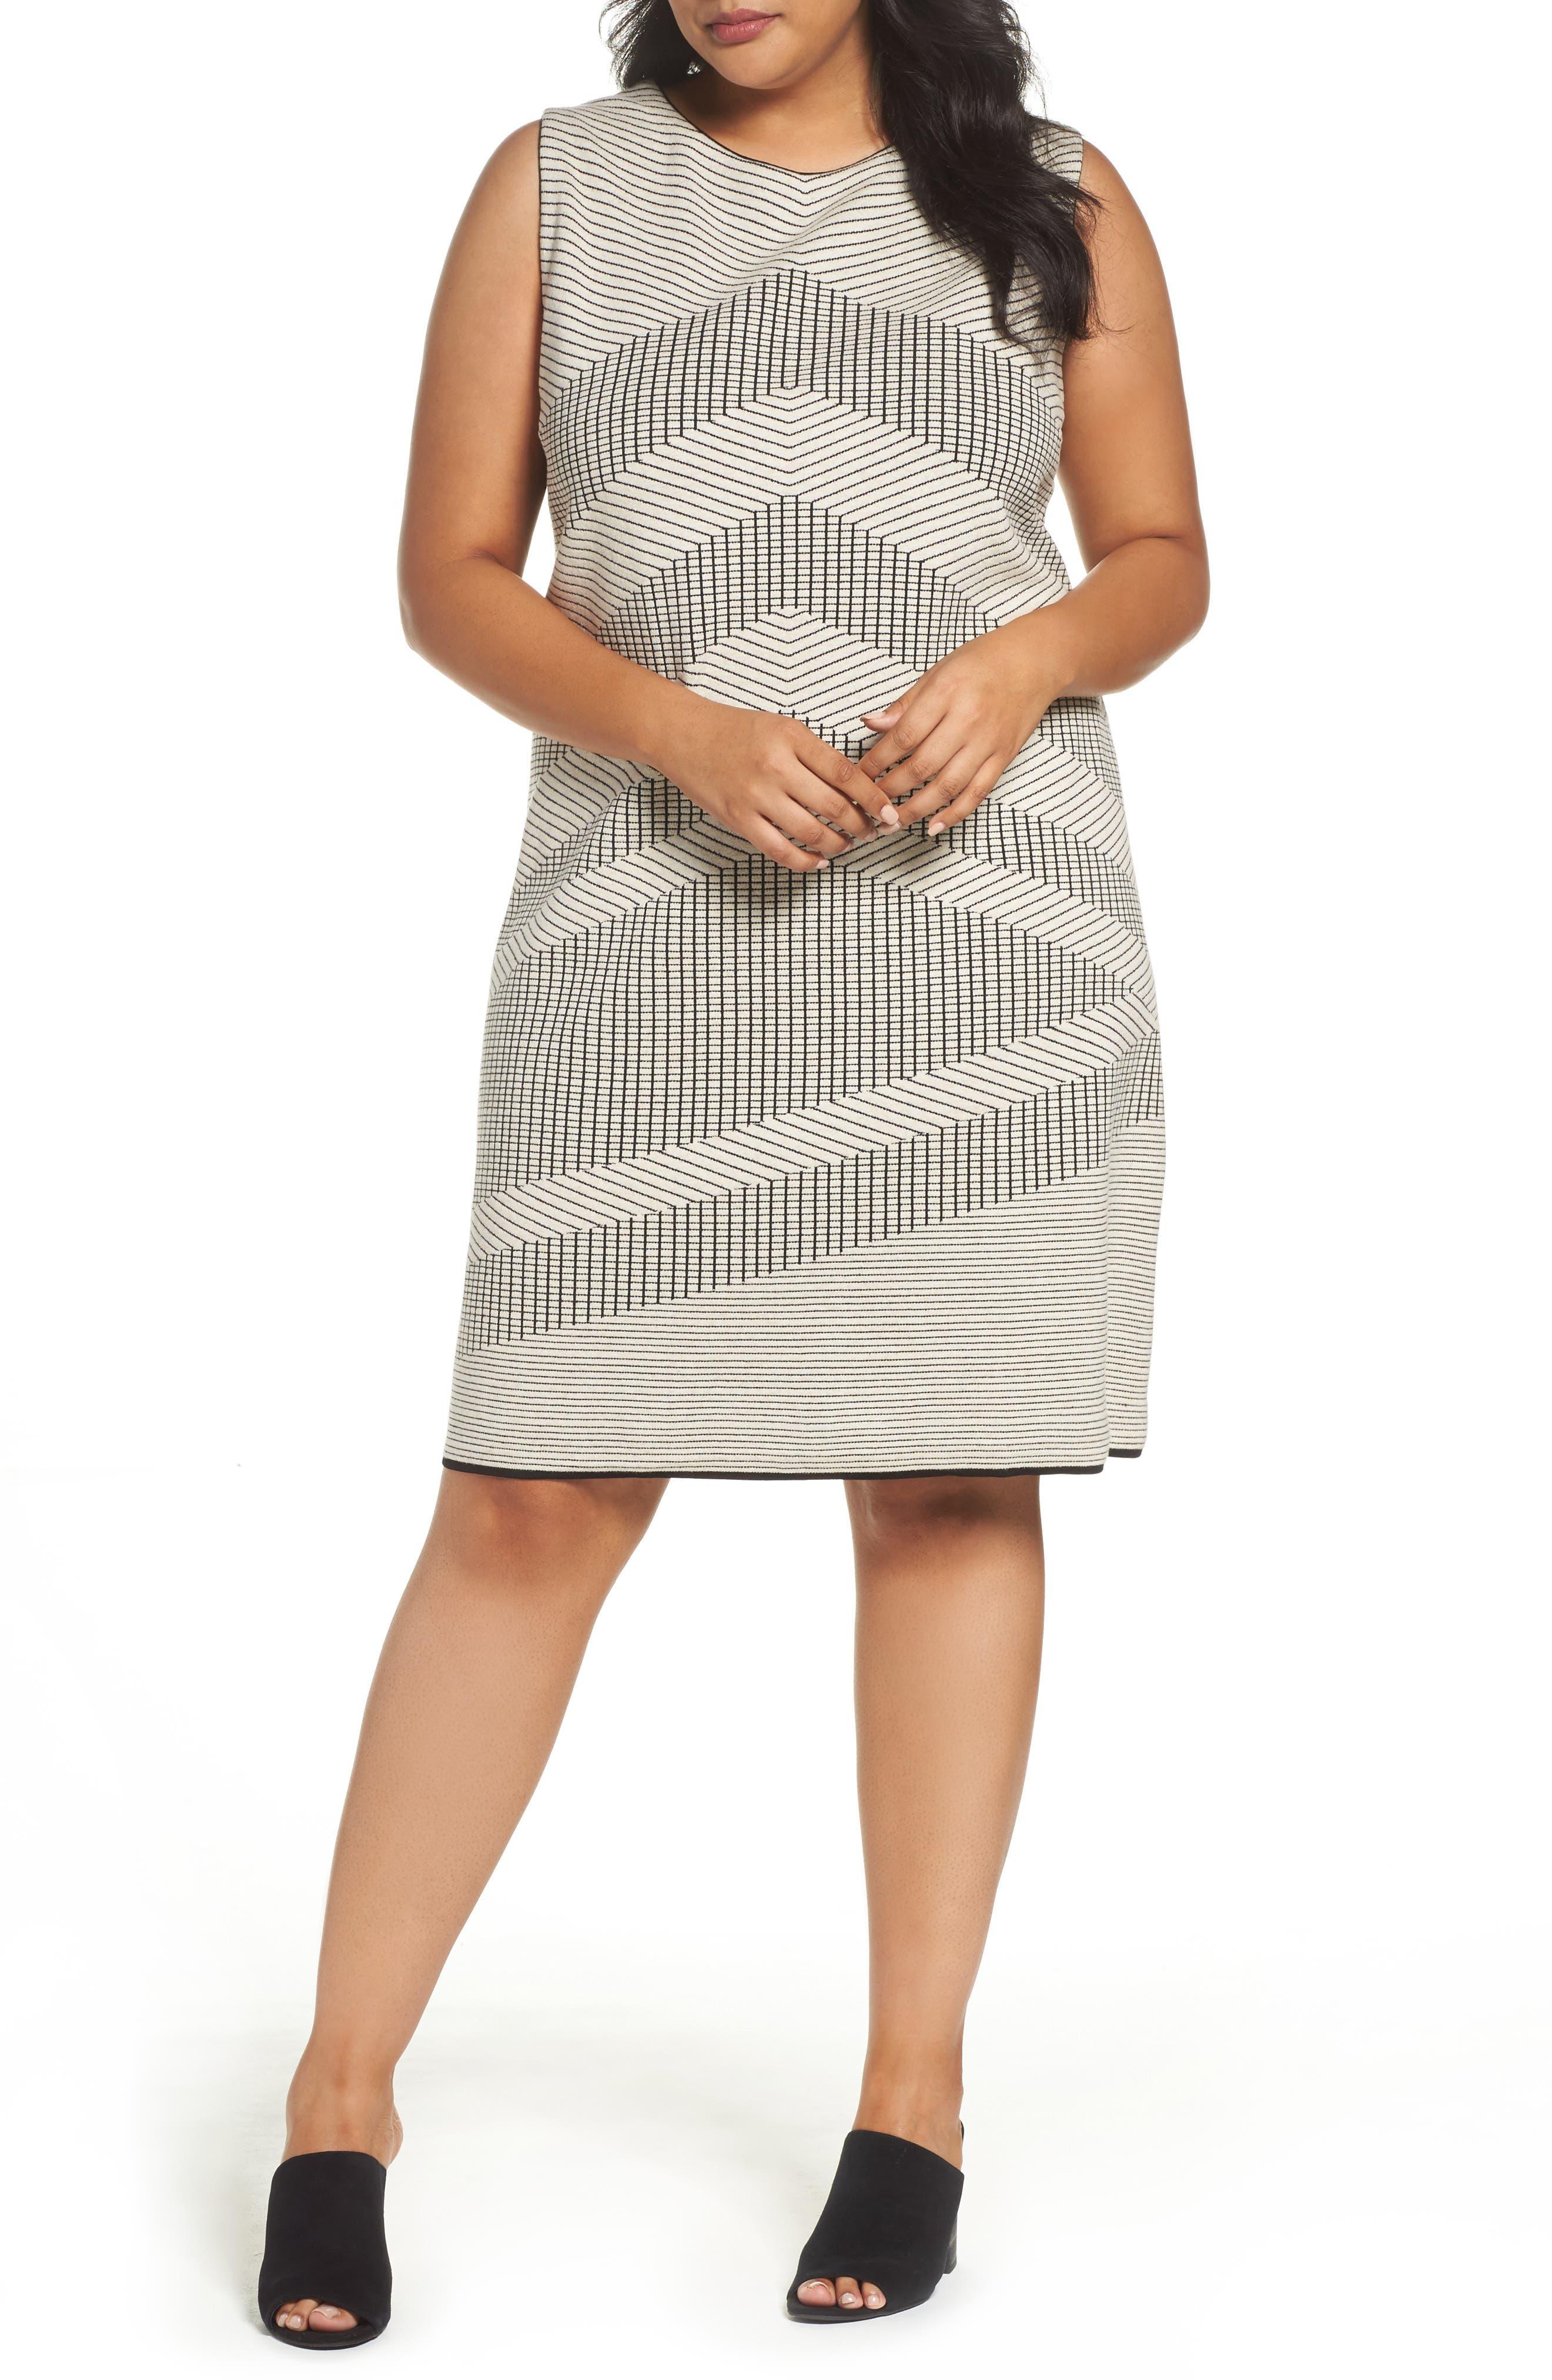 Mantra Chevron Stripe Knit Sheath Dress,                         Main,                         color, Creme Brulee